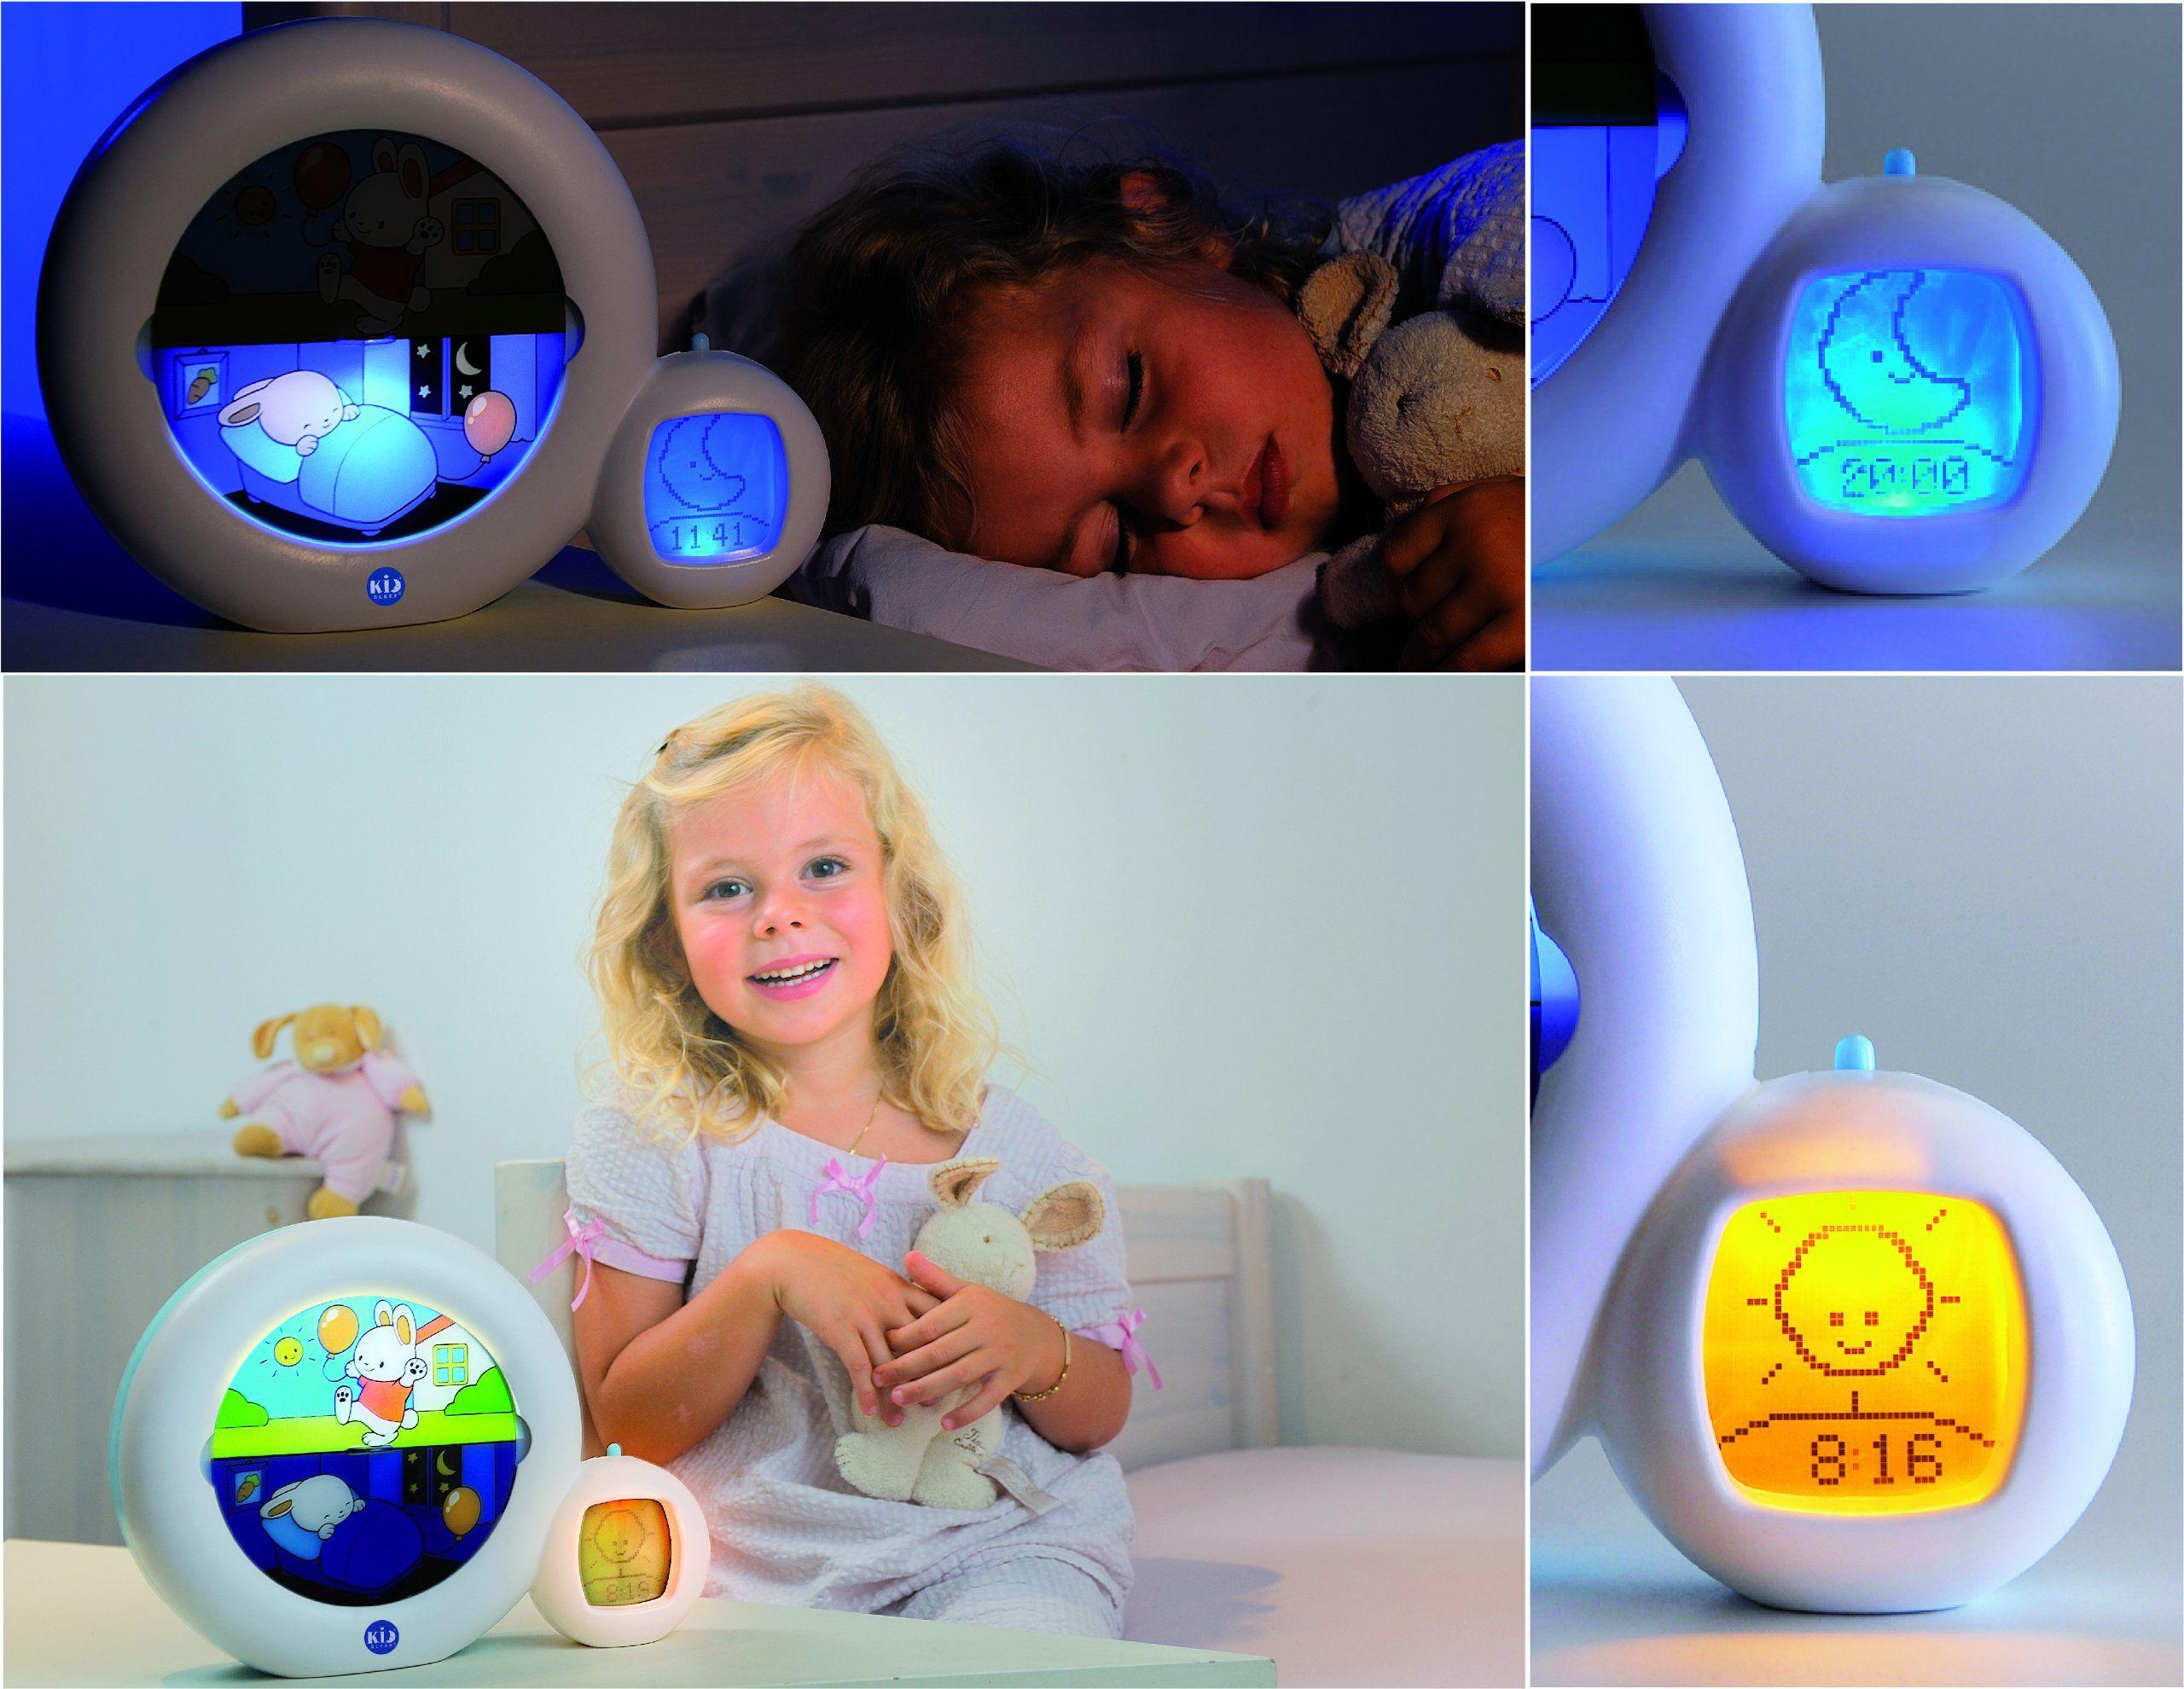 Babyzimmer Nightlight ~ Amazon claessens kids kid sleep moon nightlight white blue